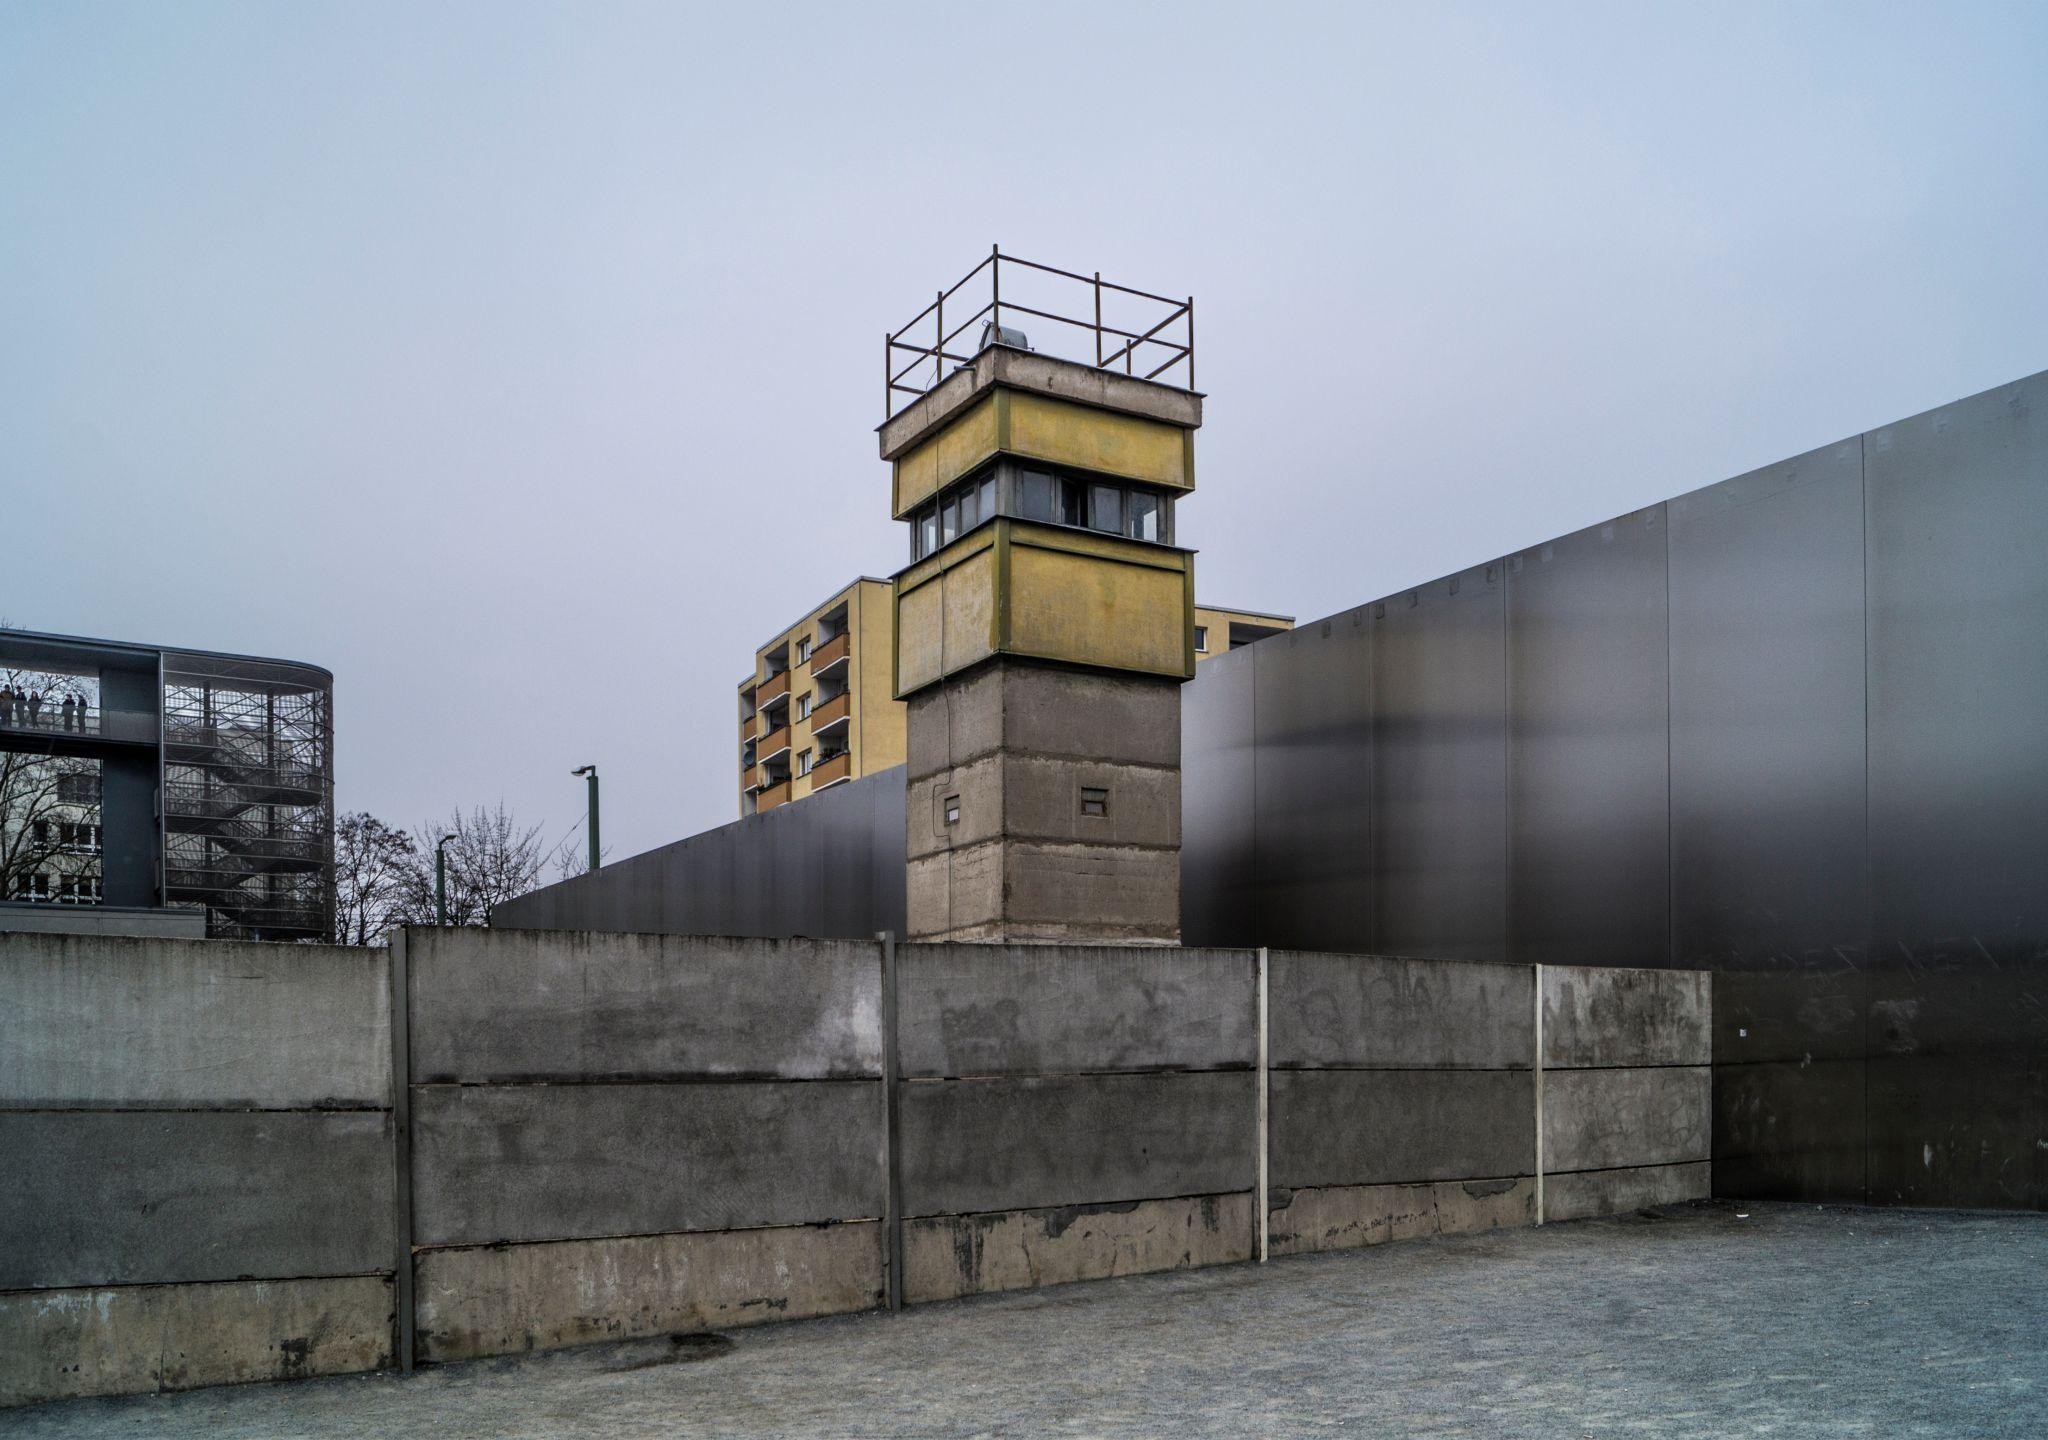 Gedenkstätte Berliner Mauer 2, Germany